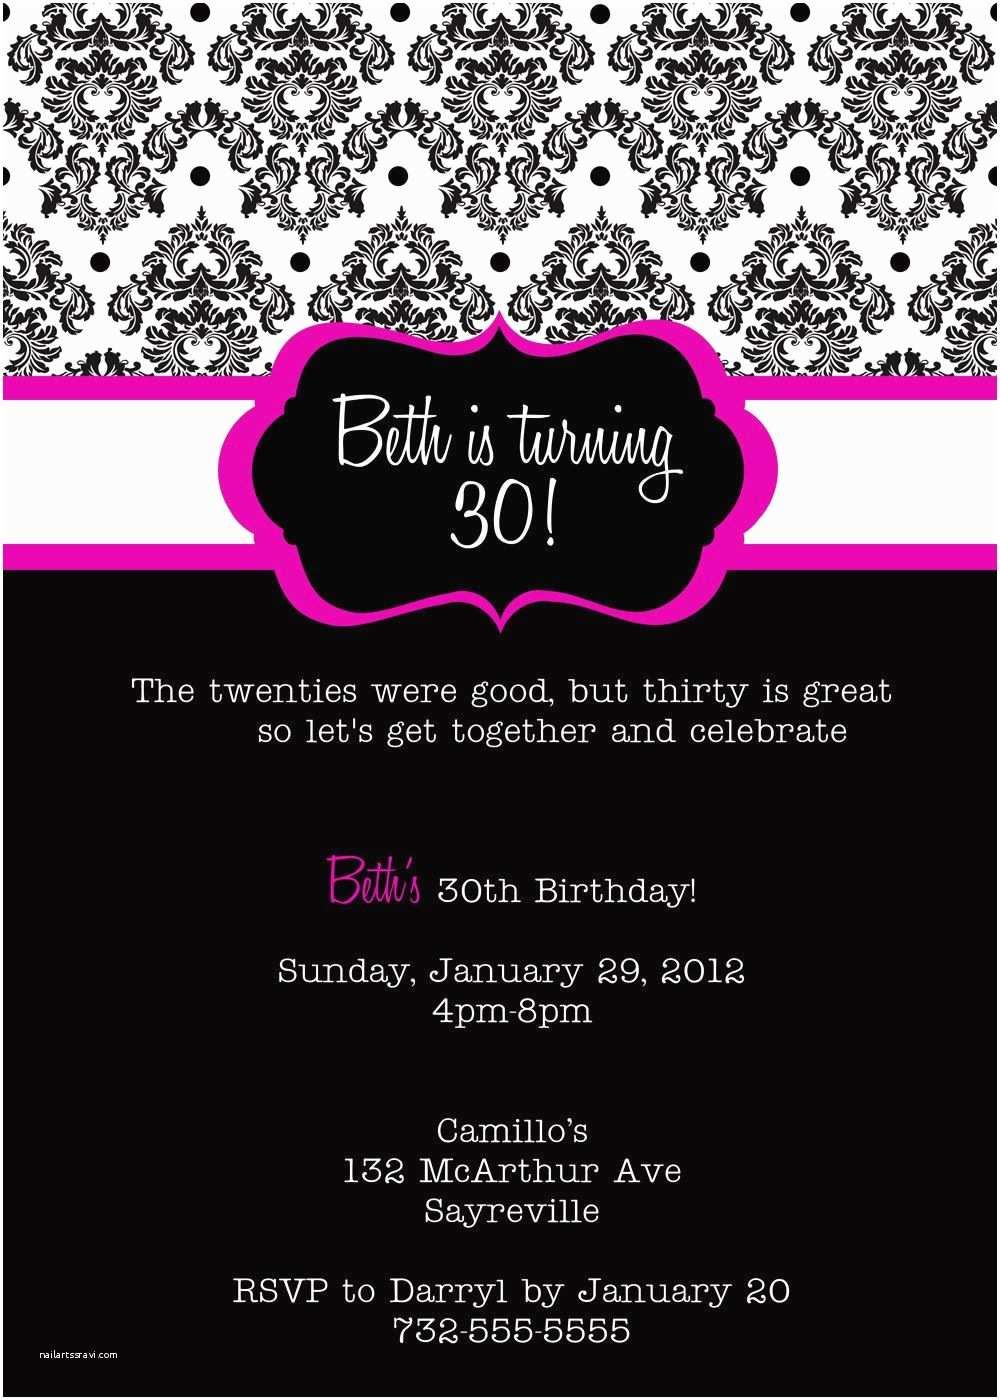 30th Birthday Invitation Wording 30th Birthday Invitations Printable